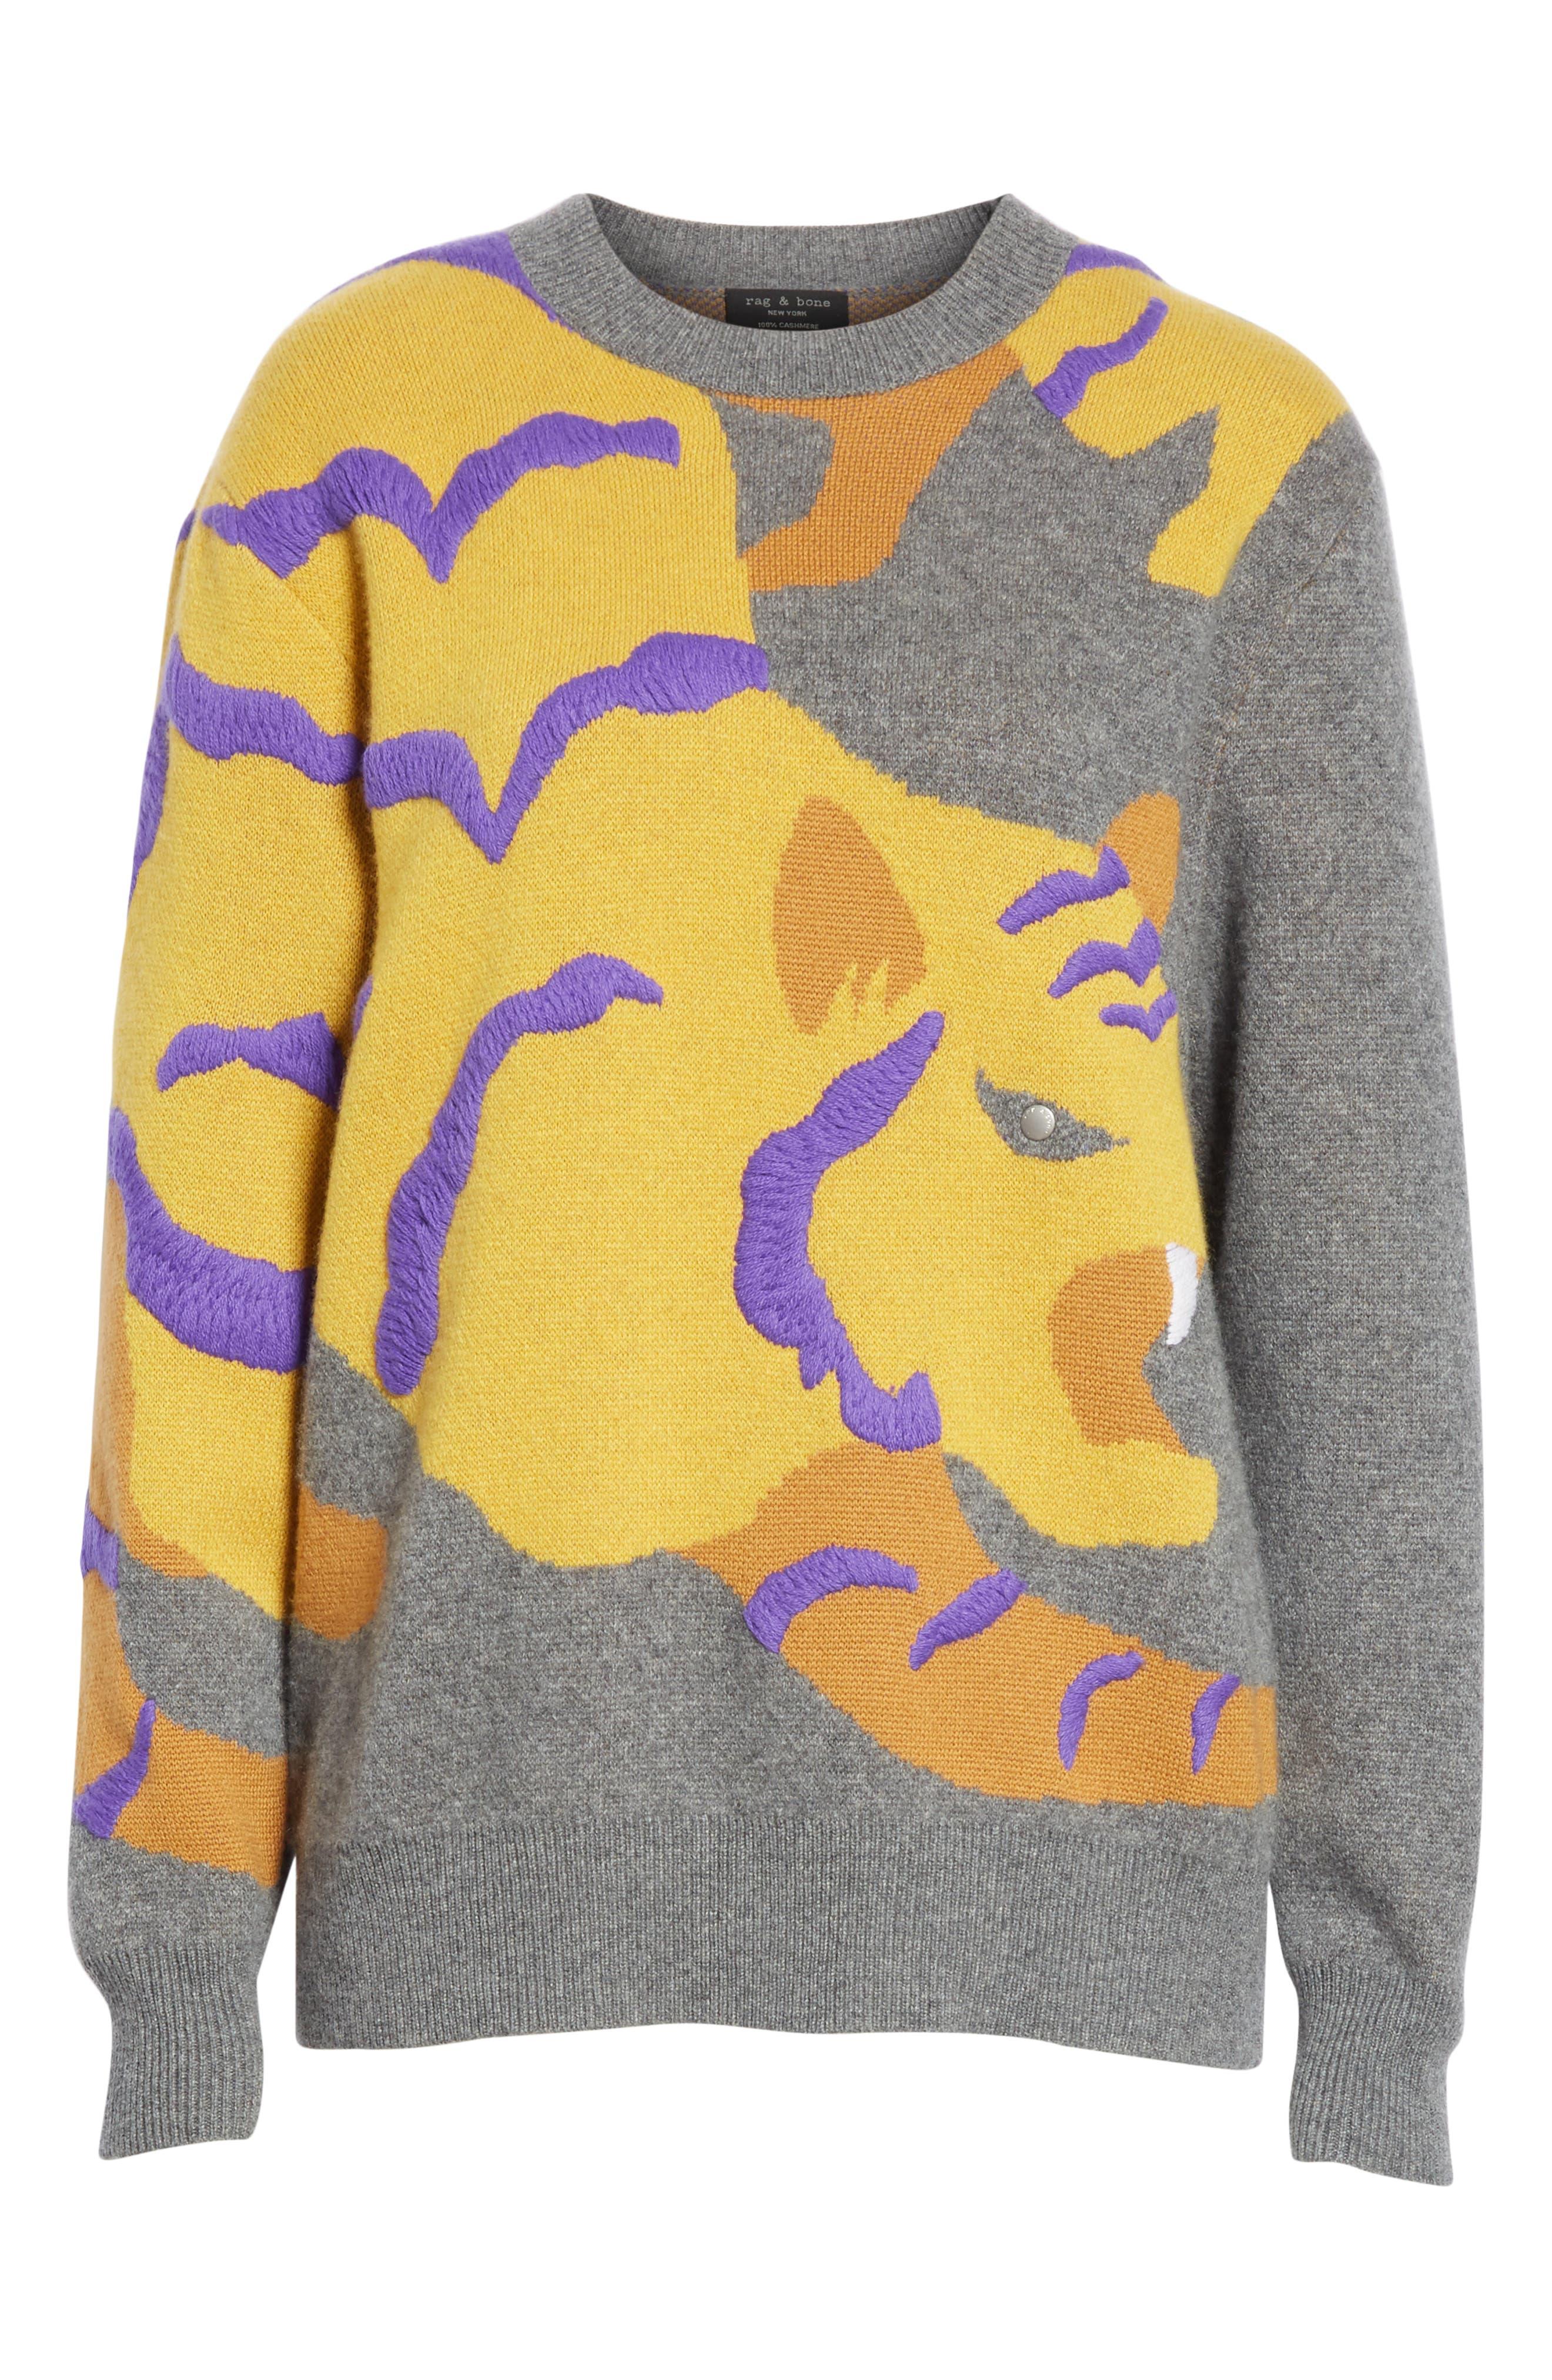 RAG & BONE,                             Tiger Cashmere Sweater,                             Alternate thumbnail 6, color,                             CHARCOAL